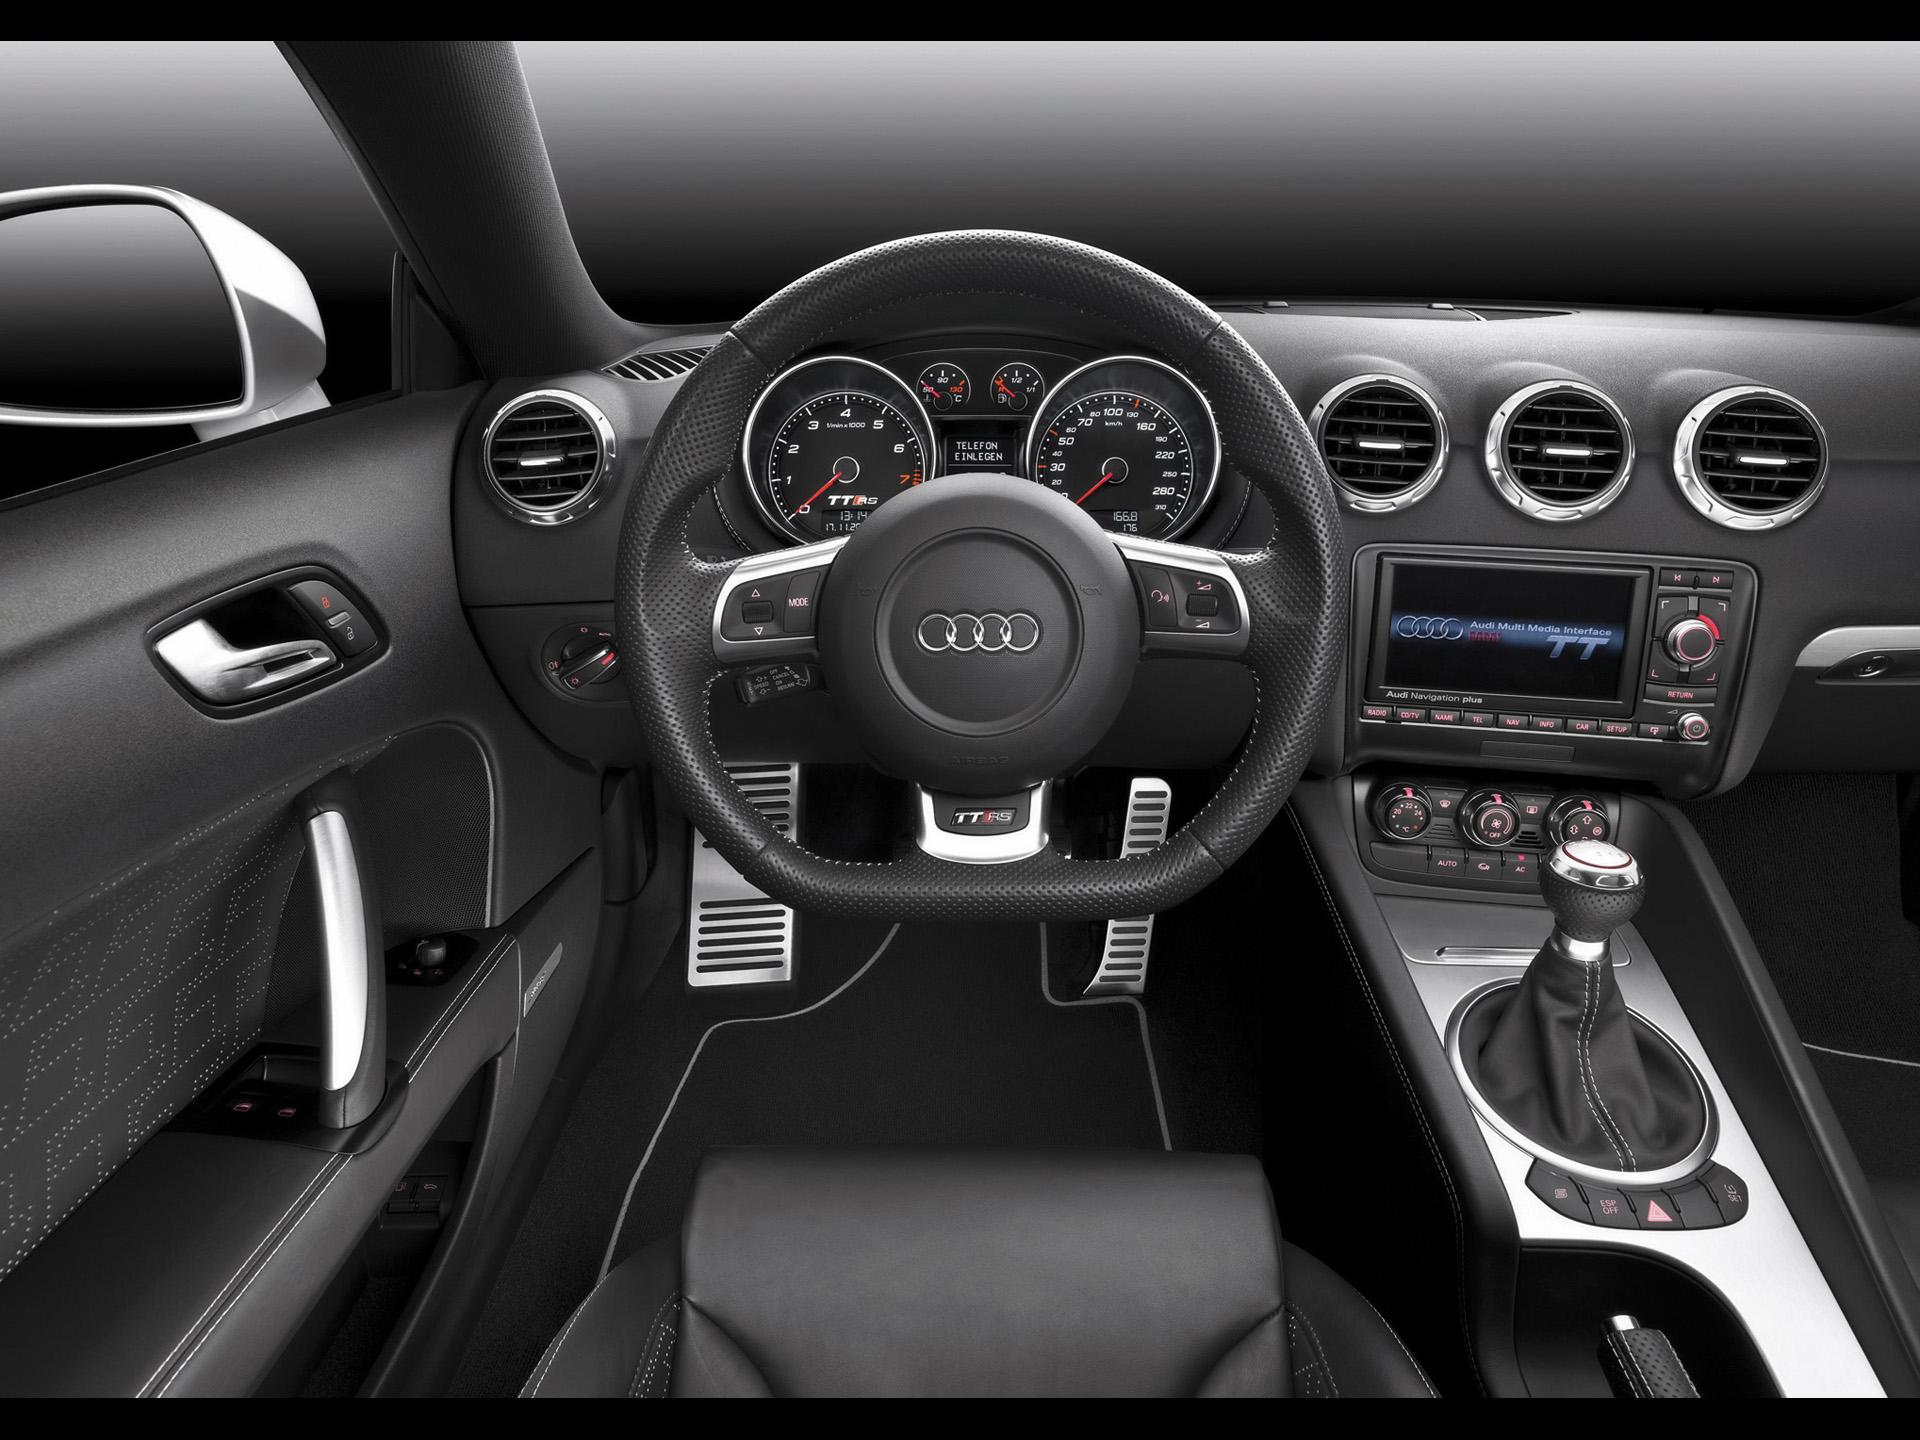 Audi TT RS II (8J) 2009 - 2014 Roadster #7